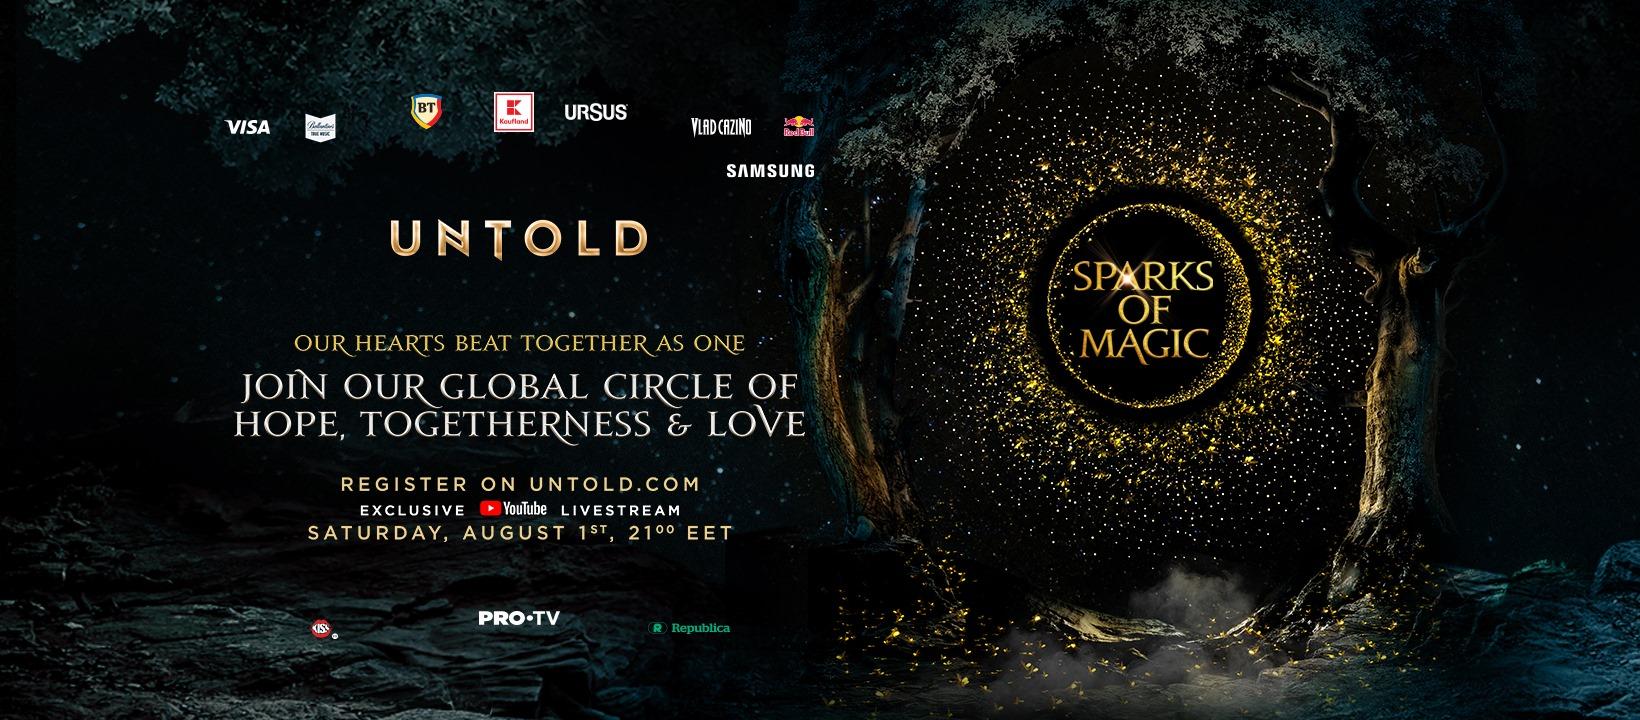 UNTOLD - SPARKS OF MAGIC